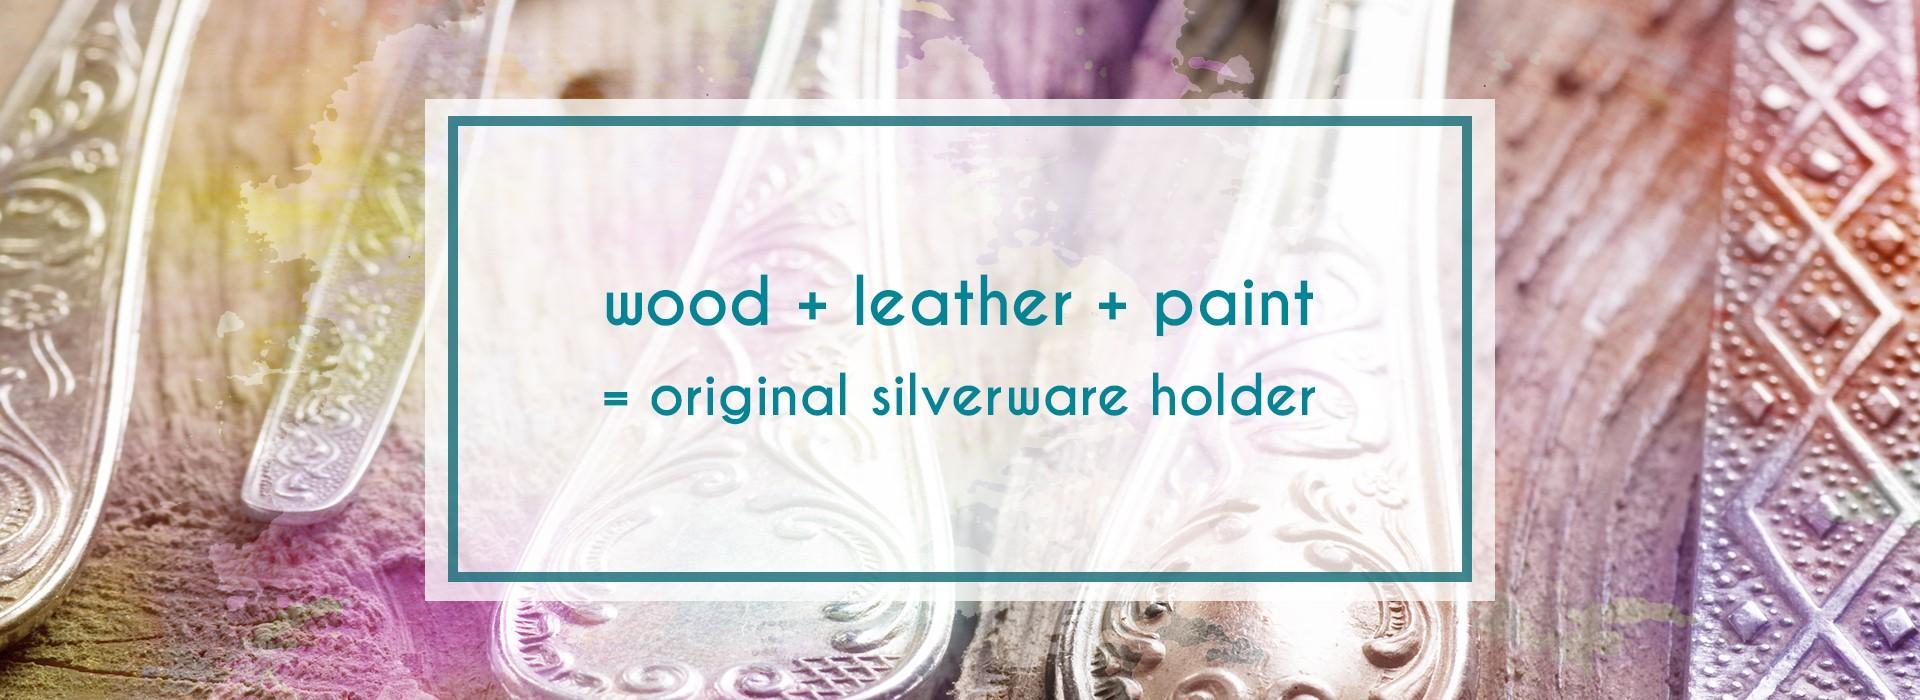 Make your own silverware holder